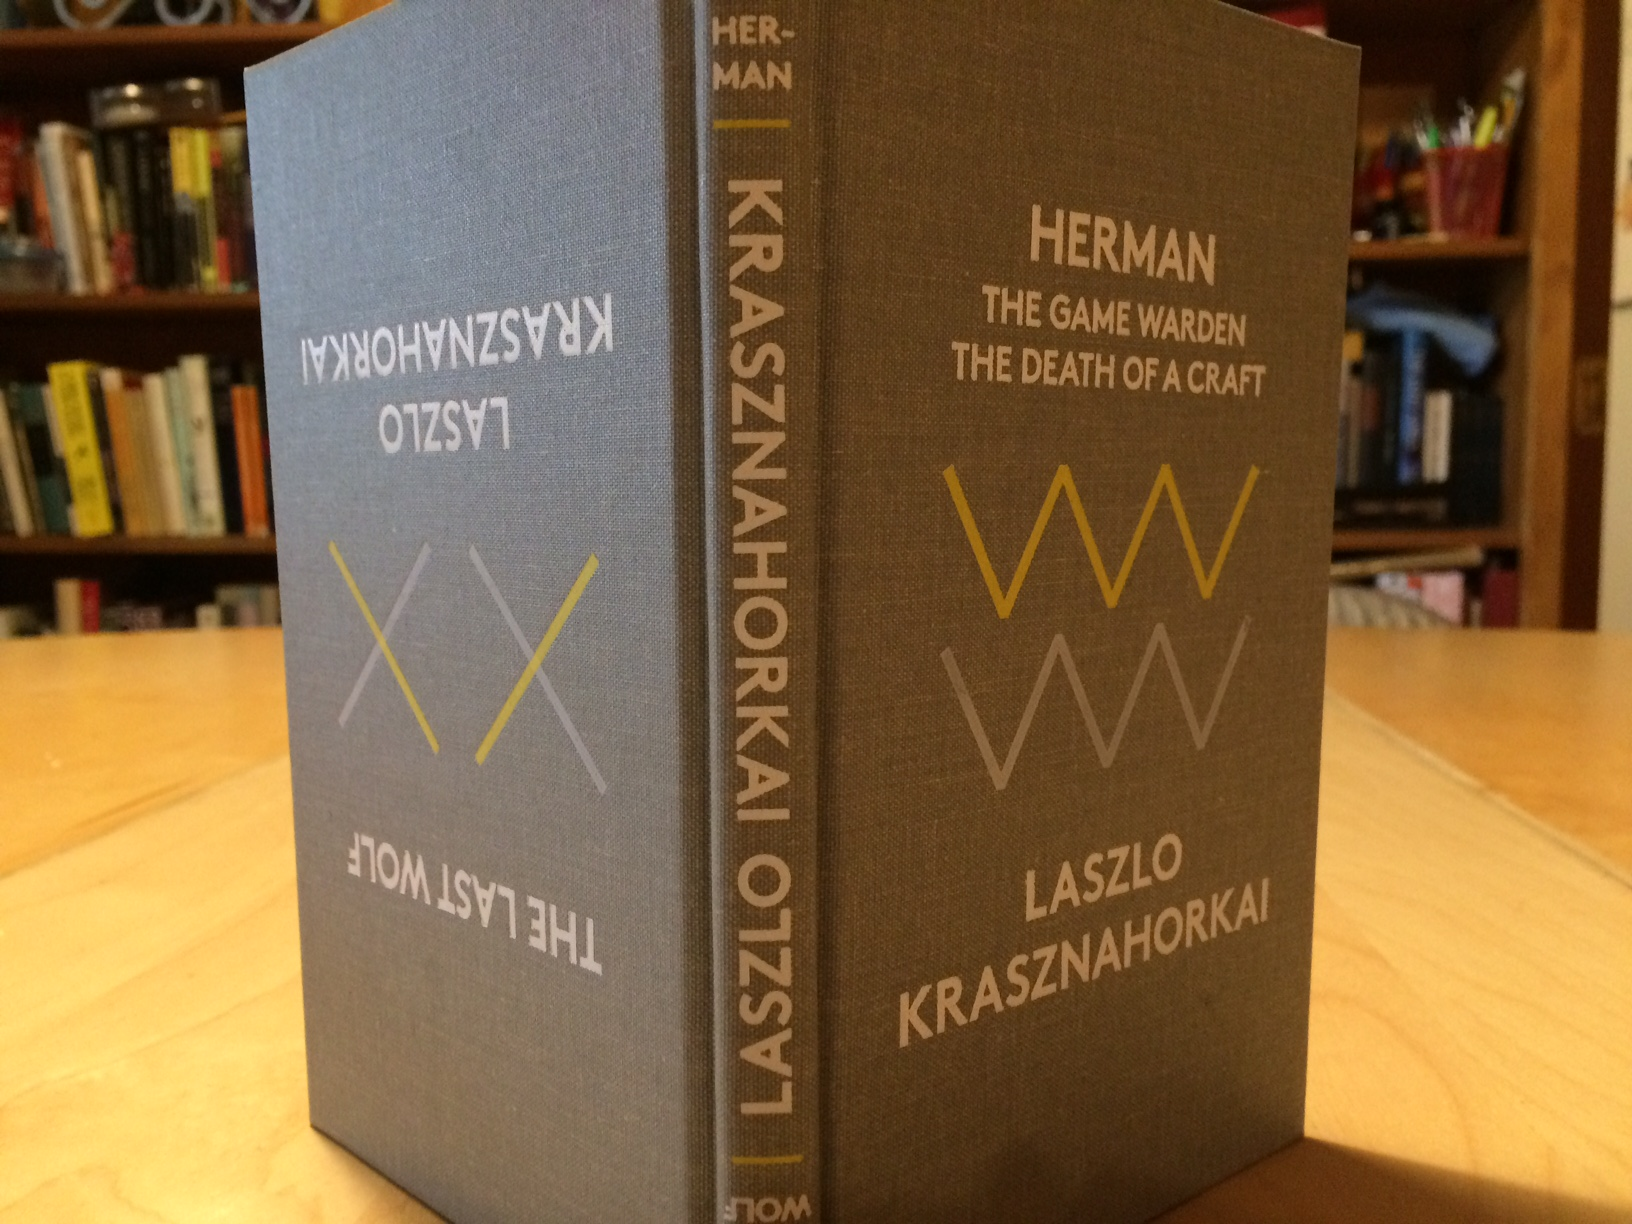 Krasznahorkai, Herman and The Last Wolf